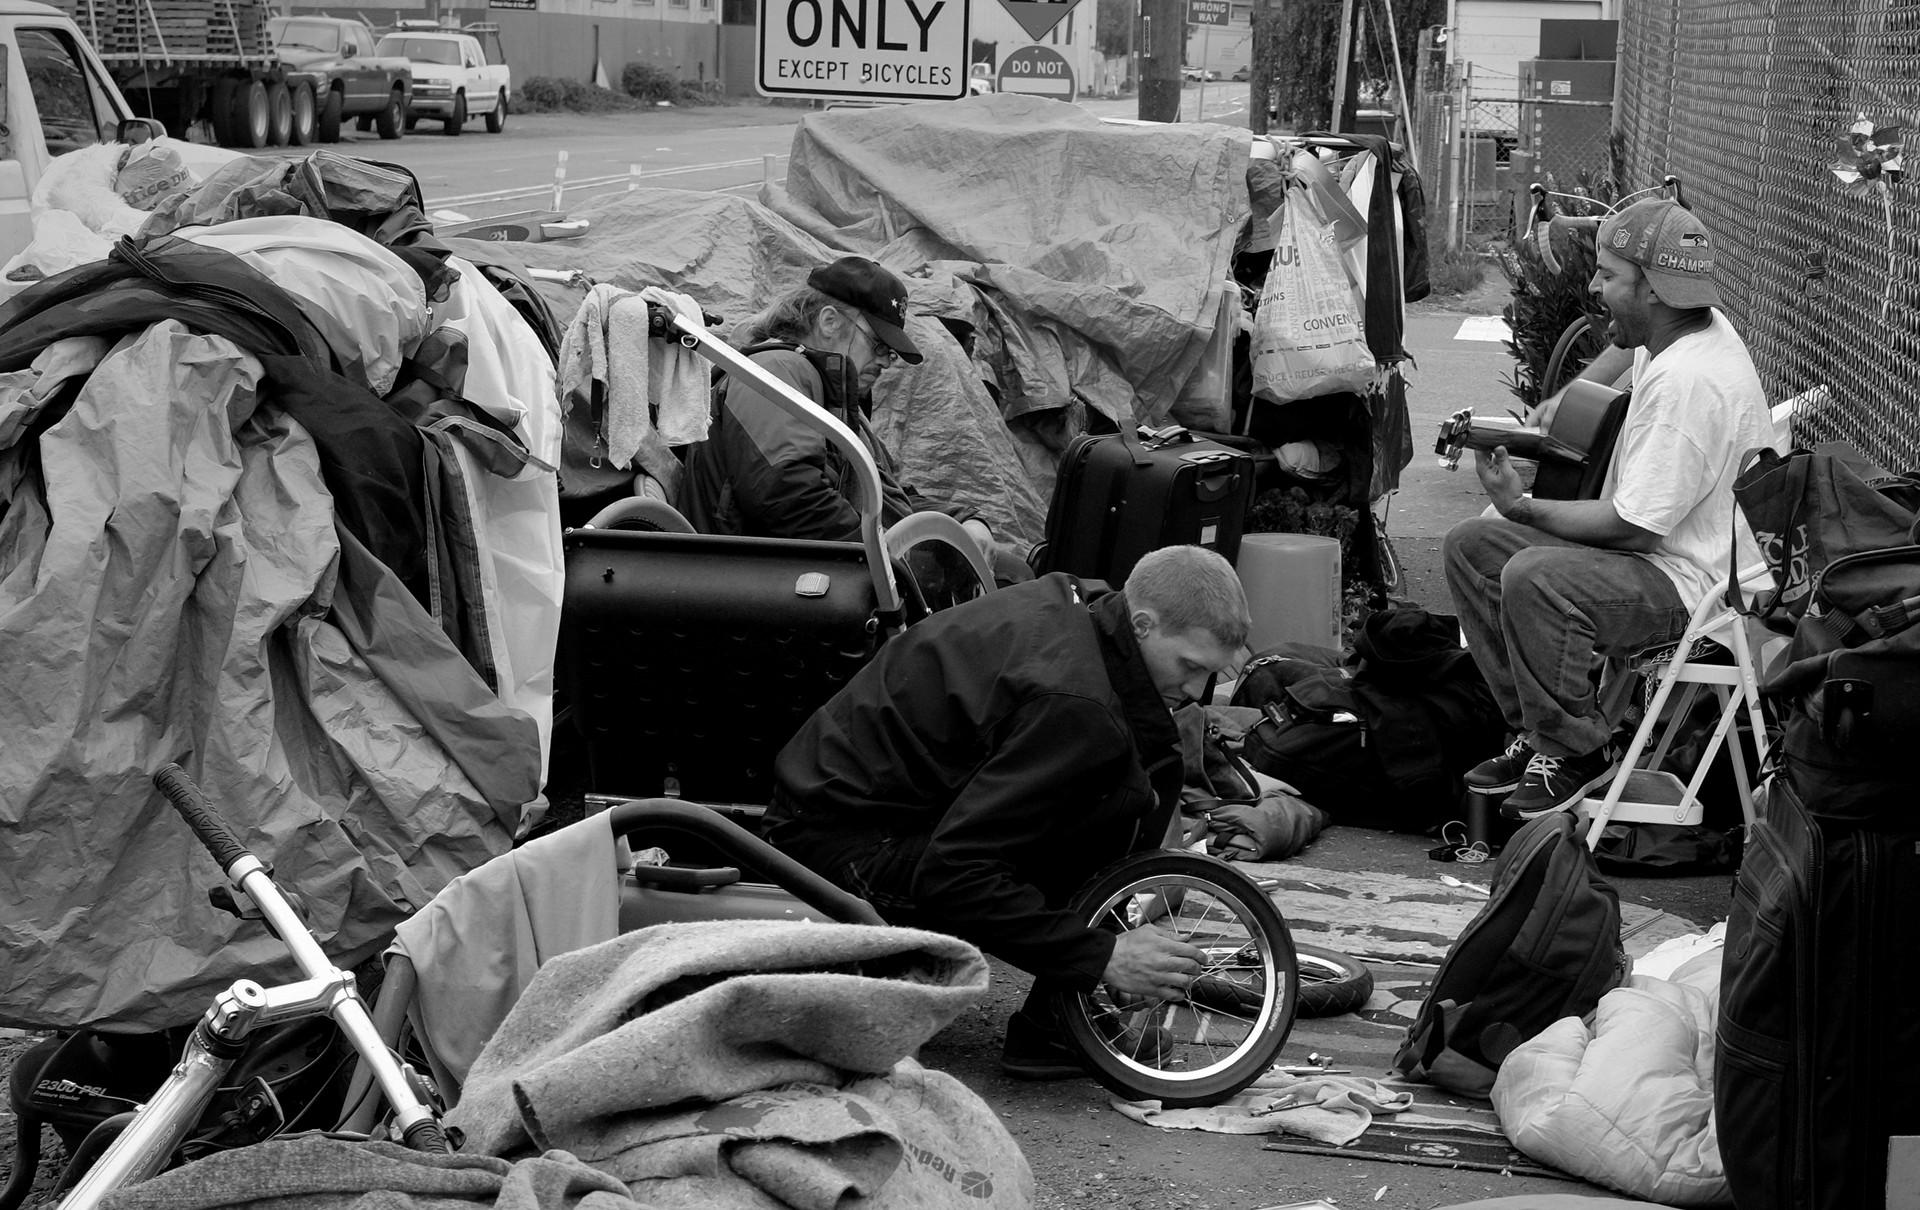 45_Leary Encampment.jpg